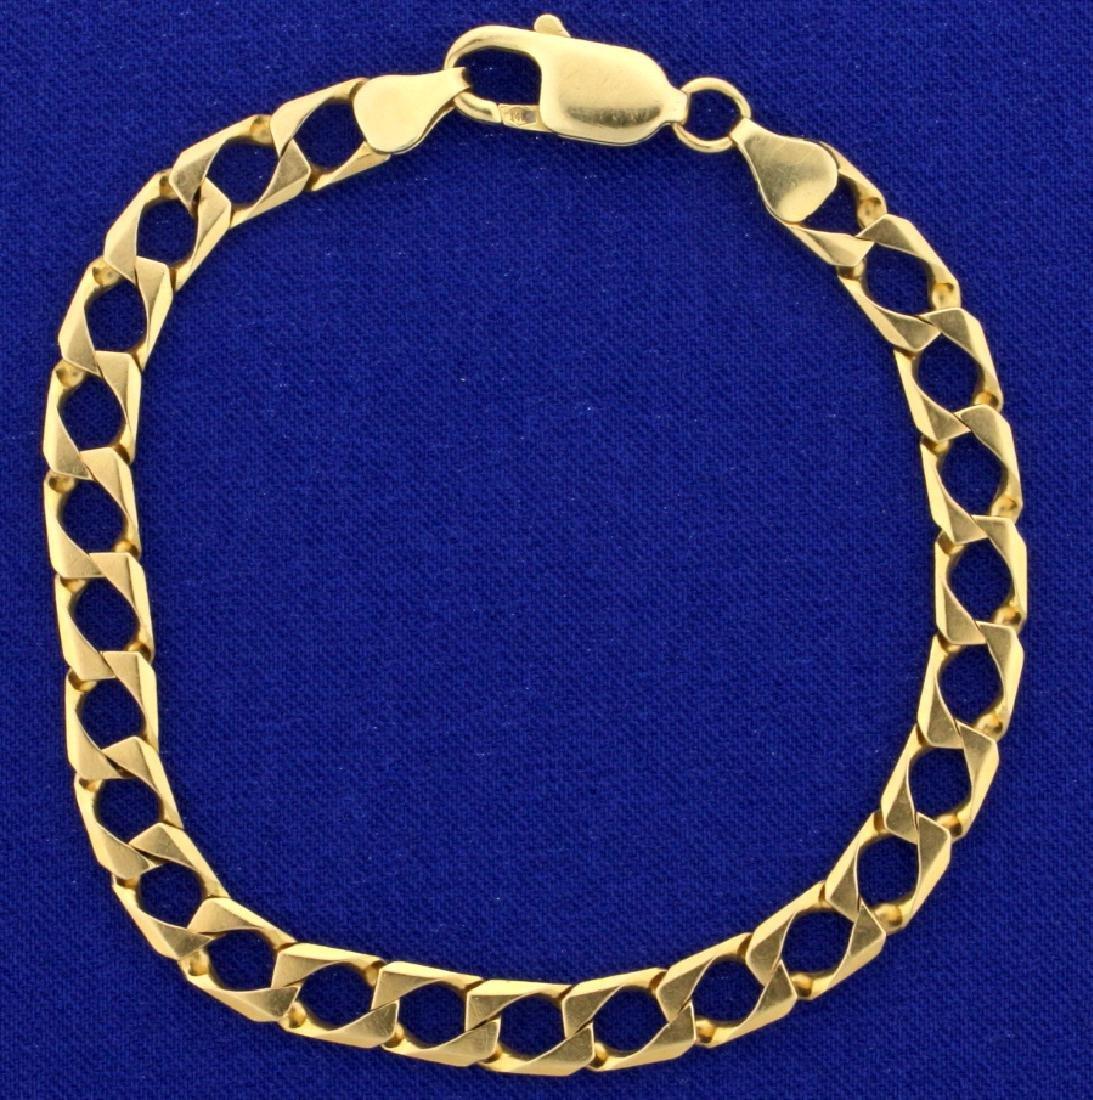 7 1/2 Inch Square Curb Link Bracelet